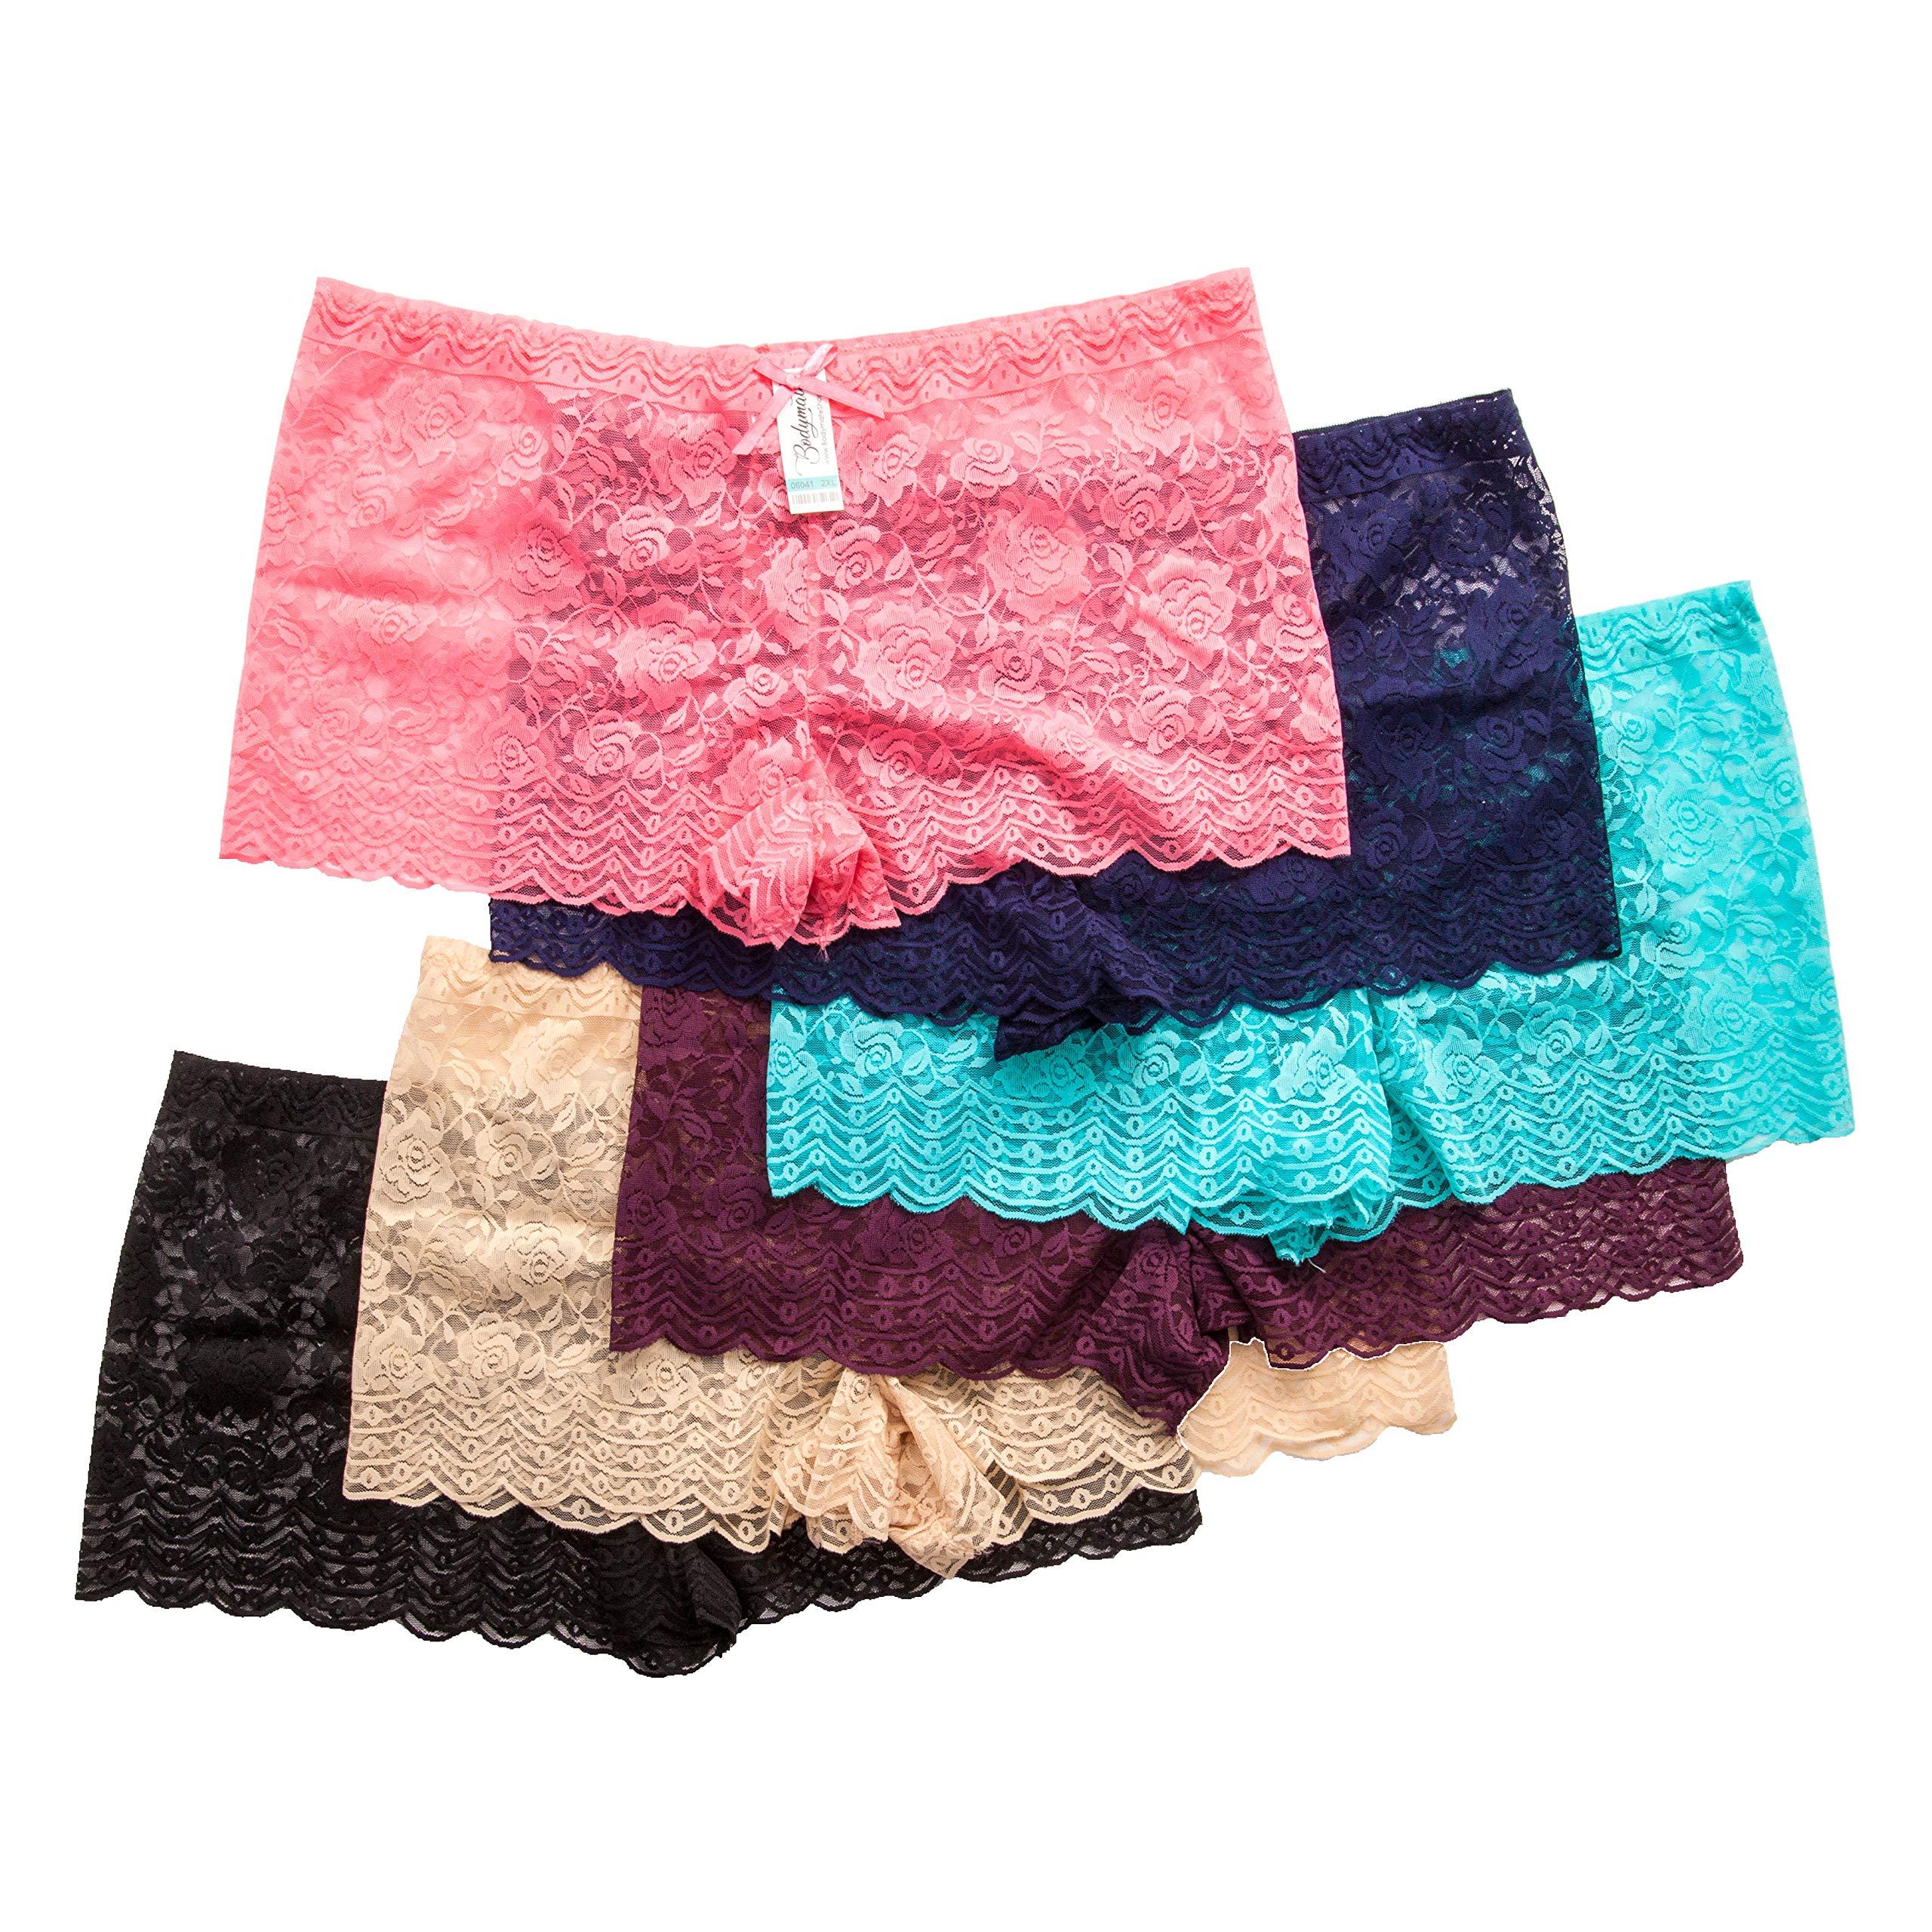 23366d688 Galleon - Barbra s 6 Pack Of Women s Plus Size Lace Boyshort Panties (2XL)